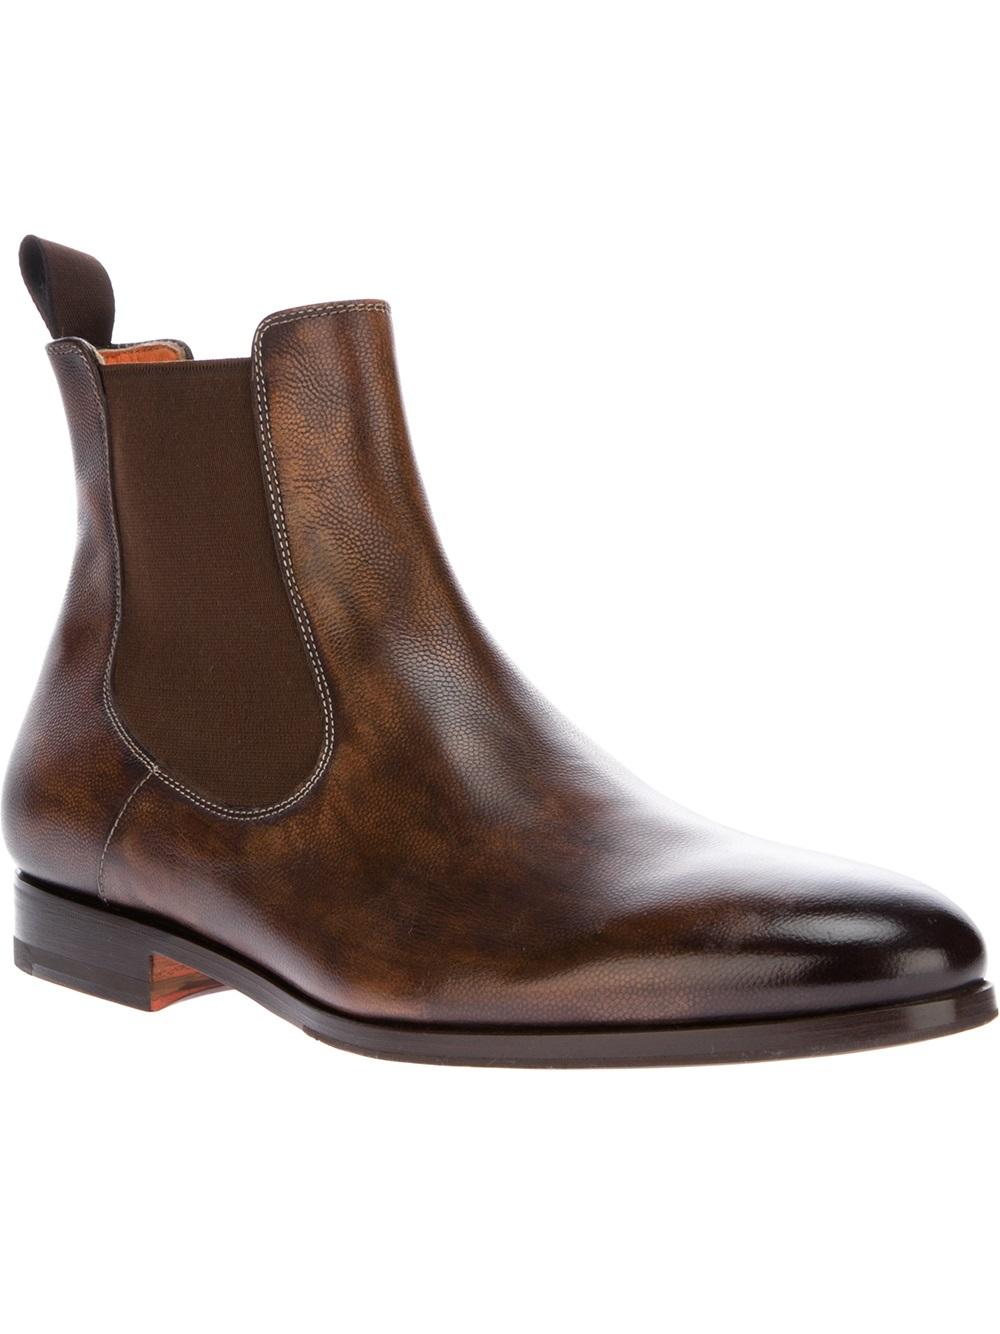 santoni chelsea boot in brown for men lyst. Black Bedroom Furniture Sets. Home Design Ideas